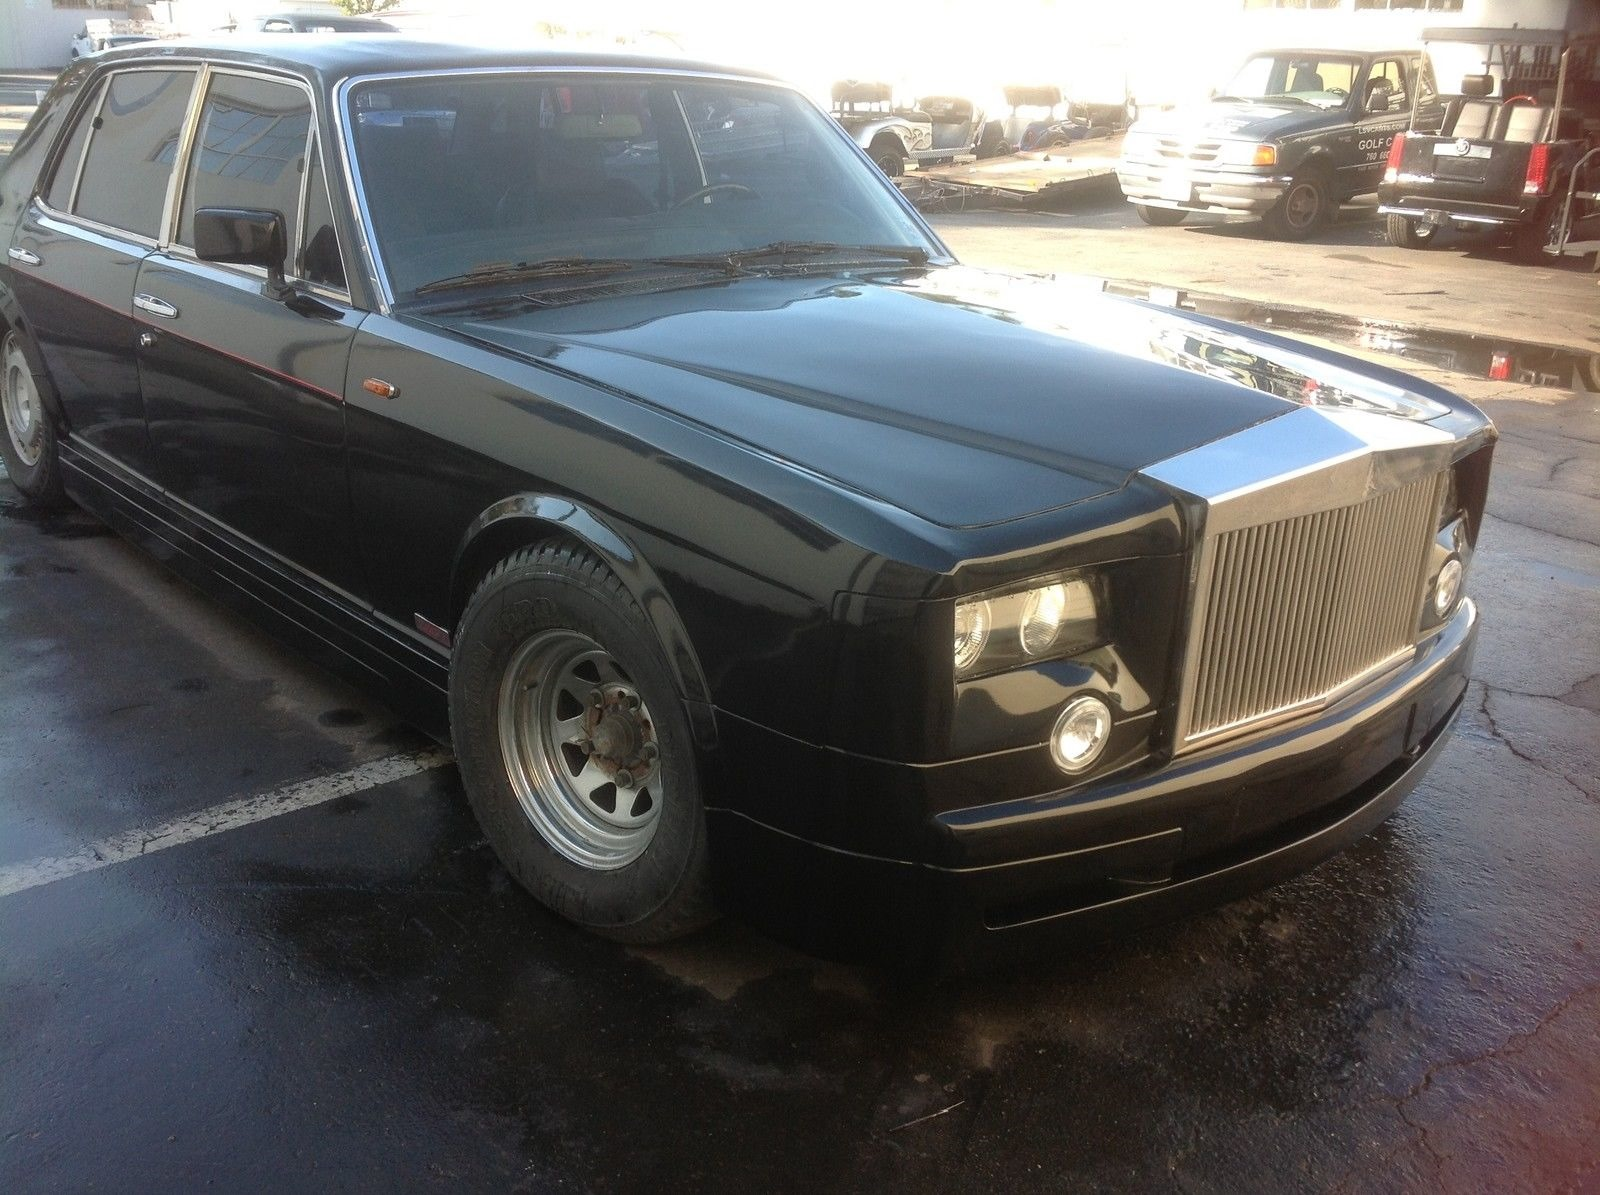 Bentley-Phantom-5%25255B2%25255D.jpg